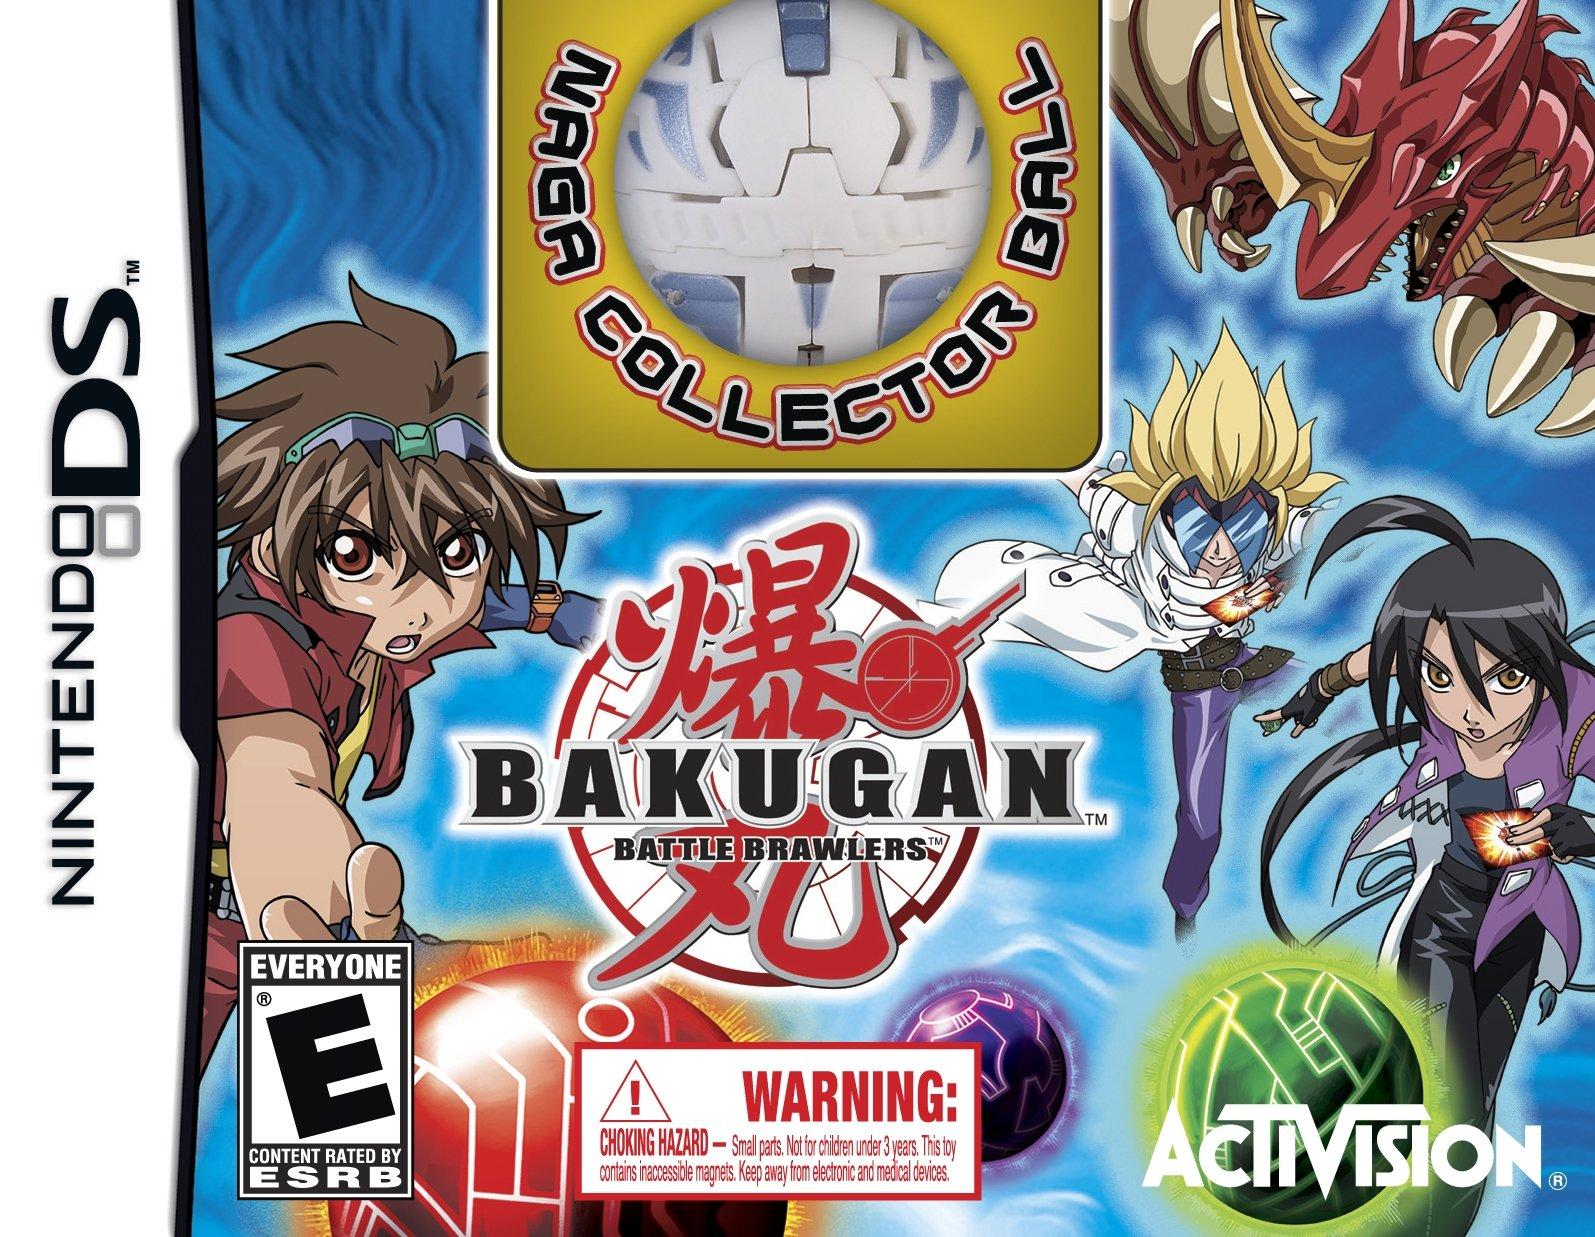 Bakugan Battle Brawlers Collector's Edition with NAGA Collector Bakugan Ball - Nintendo DS